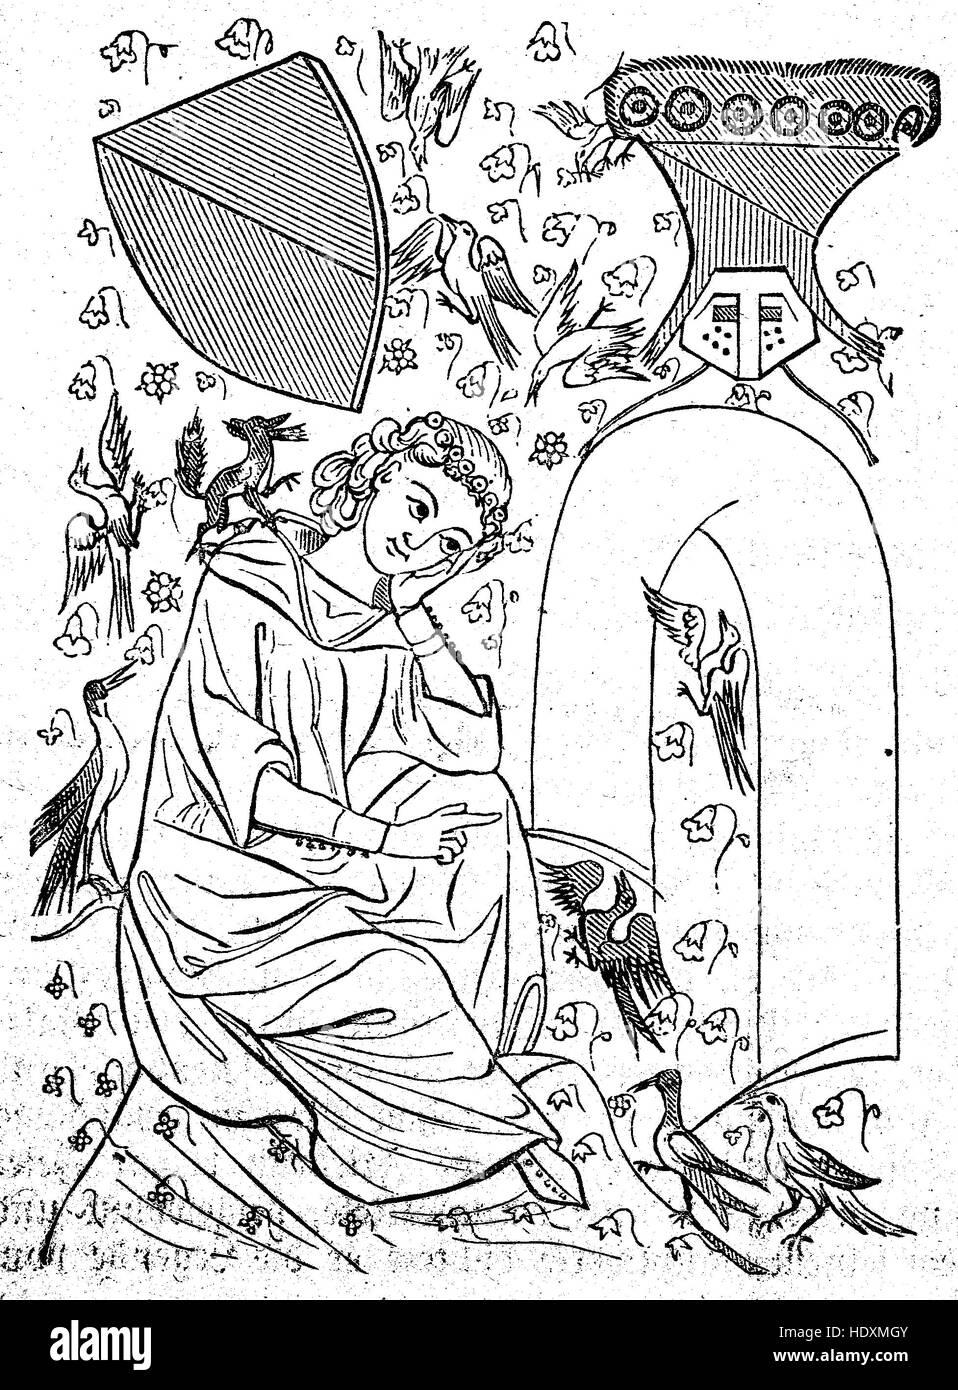 The Codex Manesse, Manesse Codex, or Grosse Heidelberger Liederhandschrift is a Liederhandschrift, book of songs/poetry - Stock Image